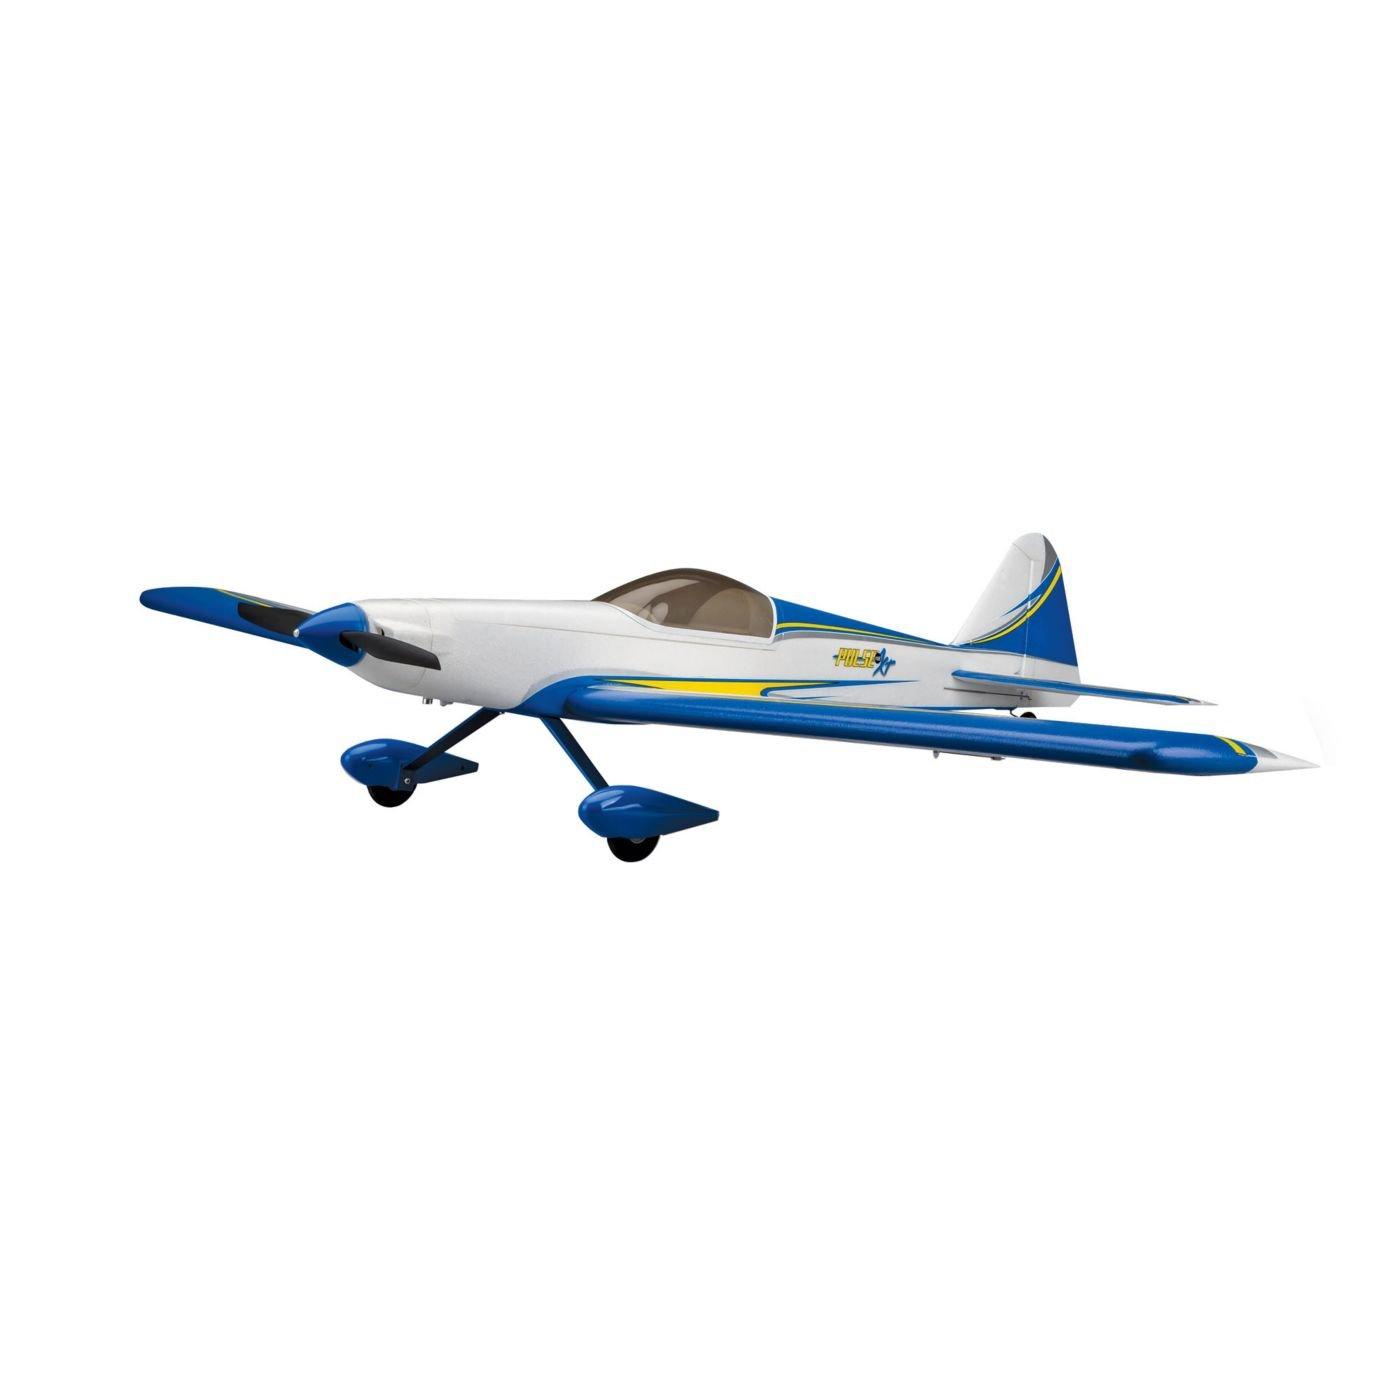 Amazon.com: Force RC Pulse 15e 1.4m PNP Radio Control Airplane: Toys & Games